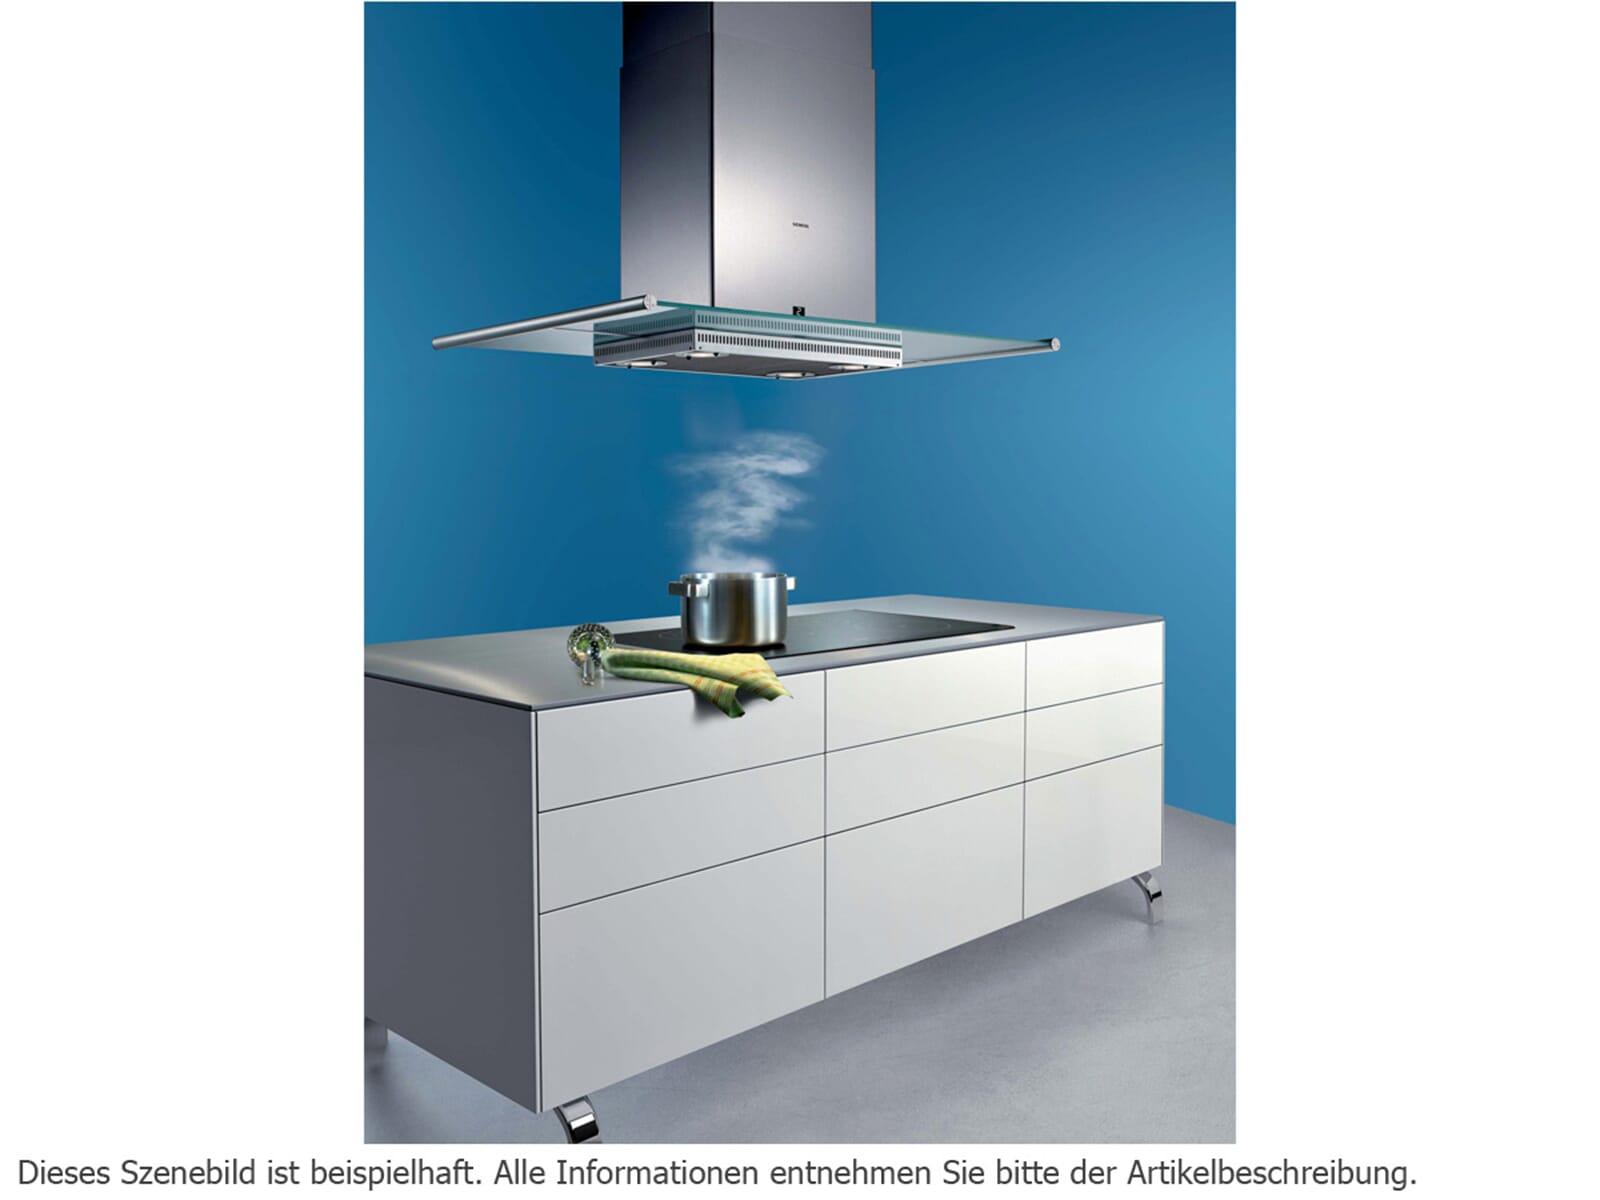 siemens lf957ga60 insel dunstabzugshaube edelstahl f r 568 90 eur. Black Bedroom Furniture Sets. Home Design Ideas